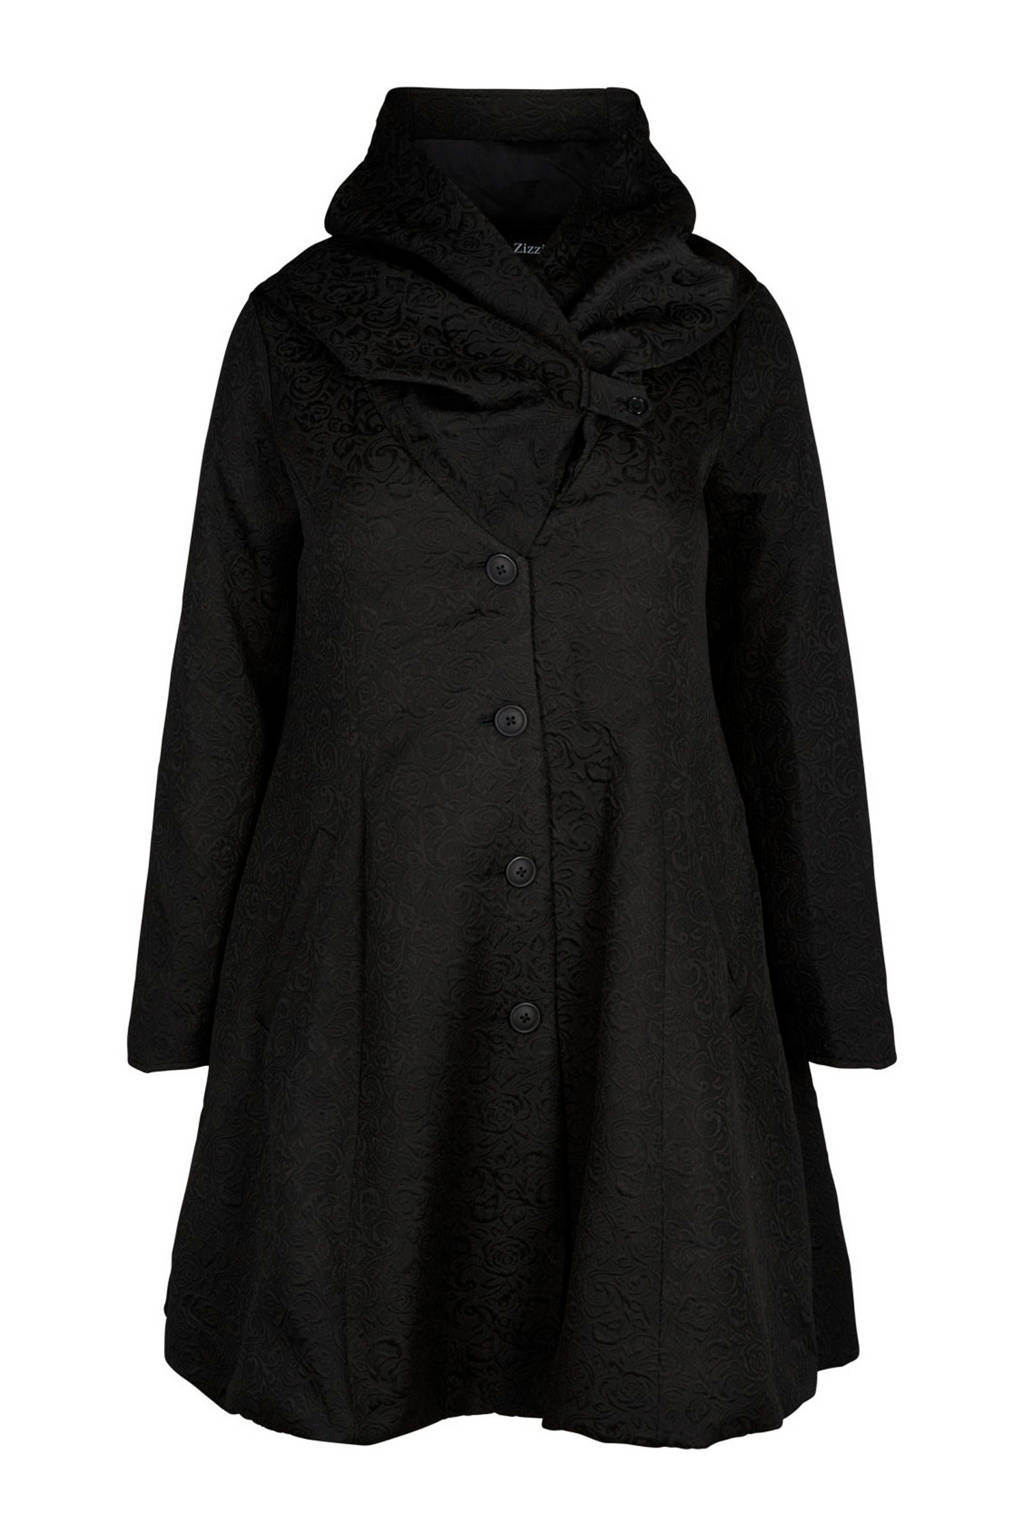 Zizzi winterjas zwart, Zwart